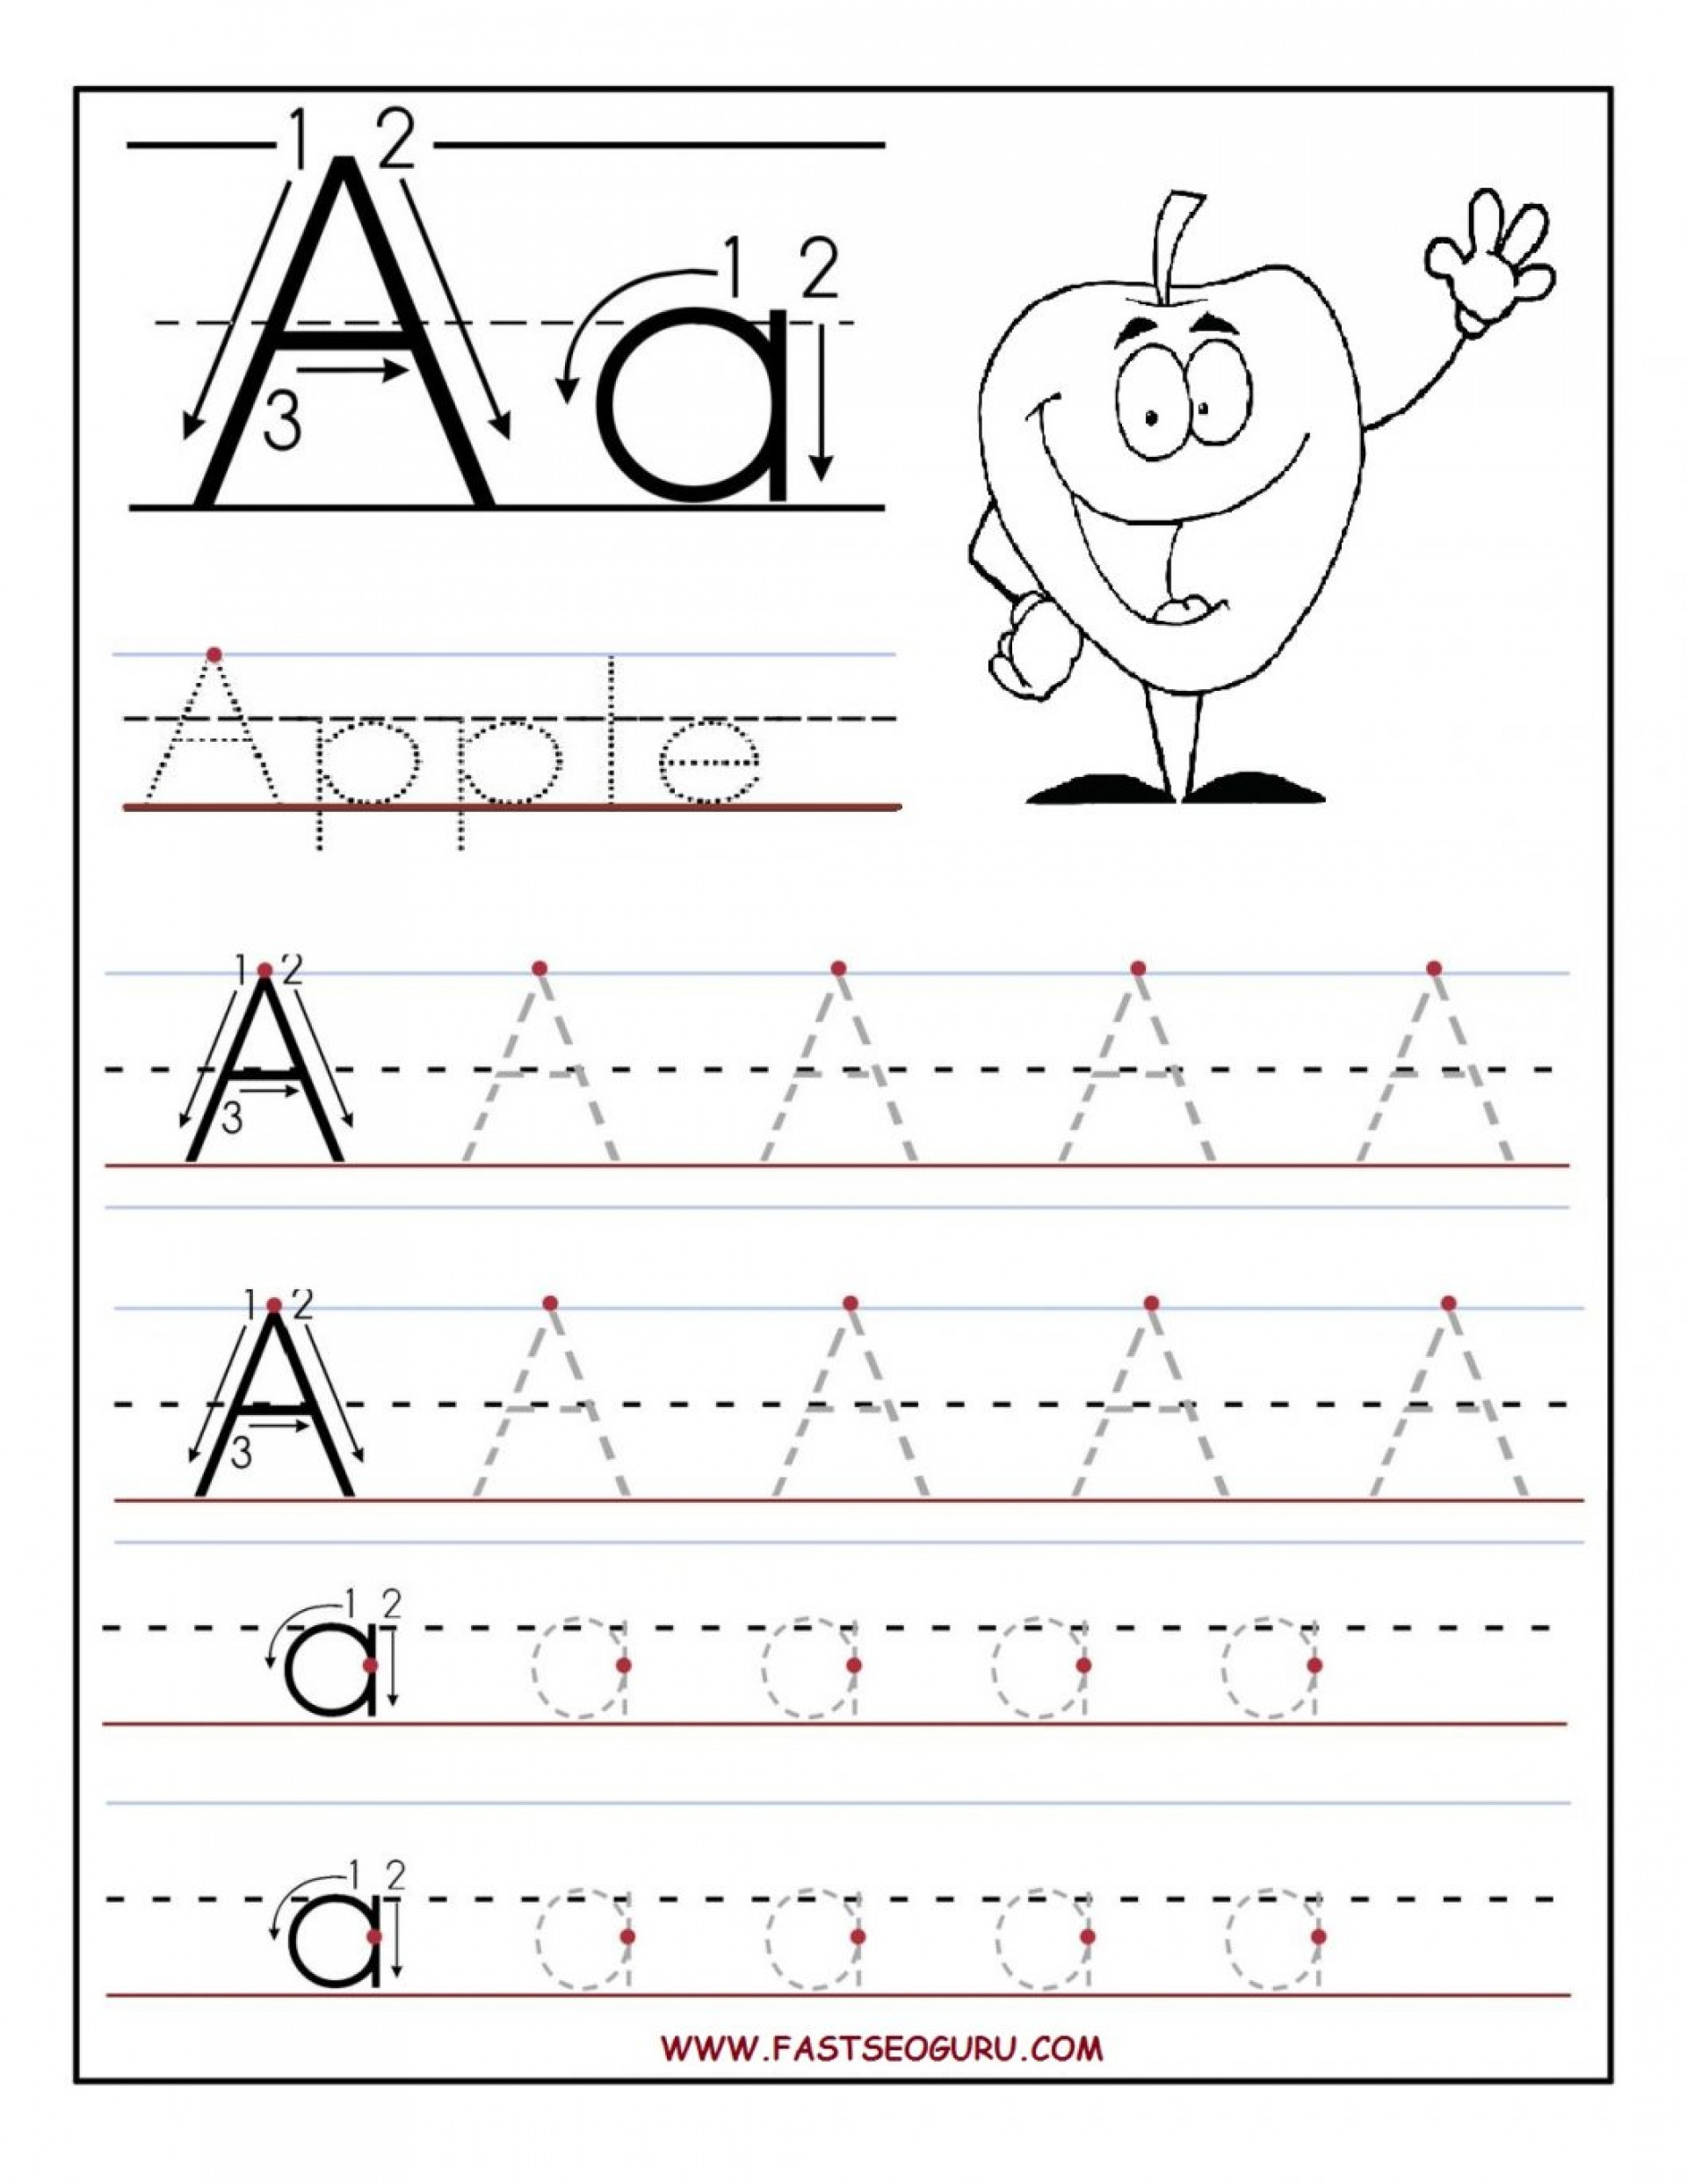 Reading Worksheets Free Printing For Kindergarten Worksheet in Alphabet Tracing Letters